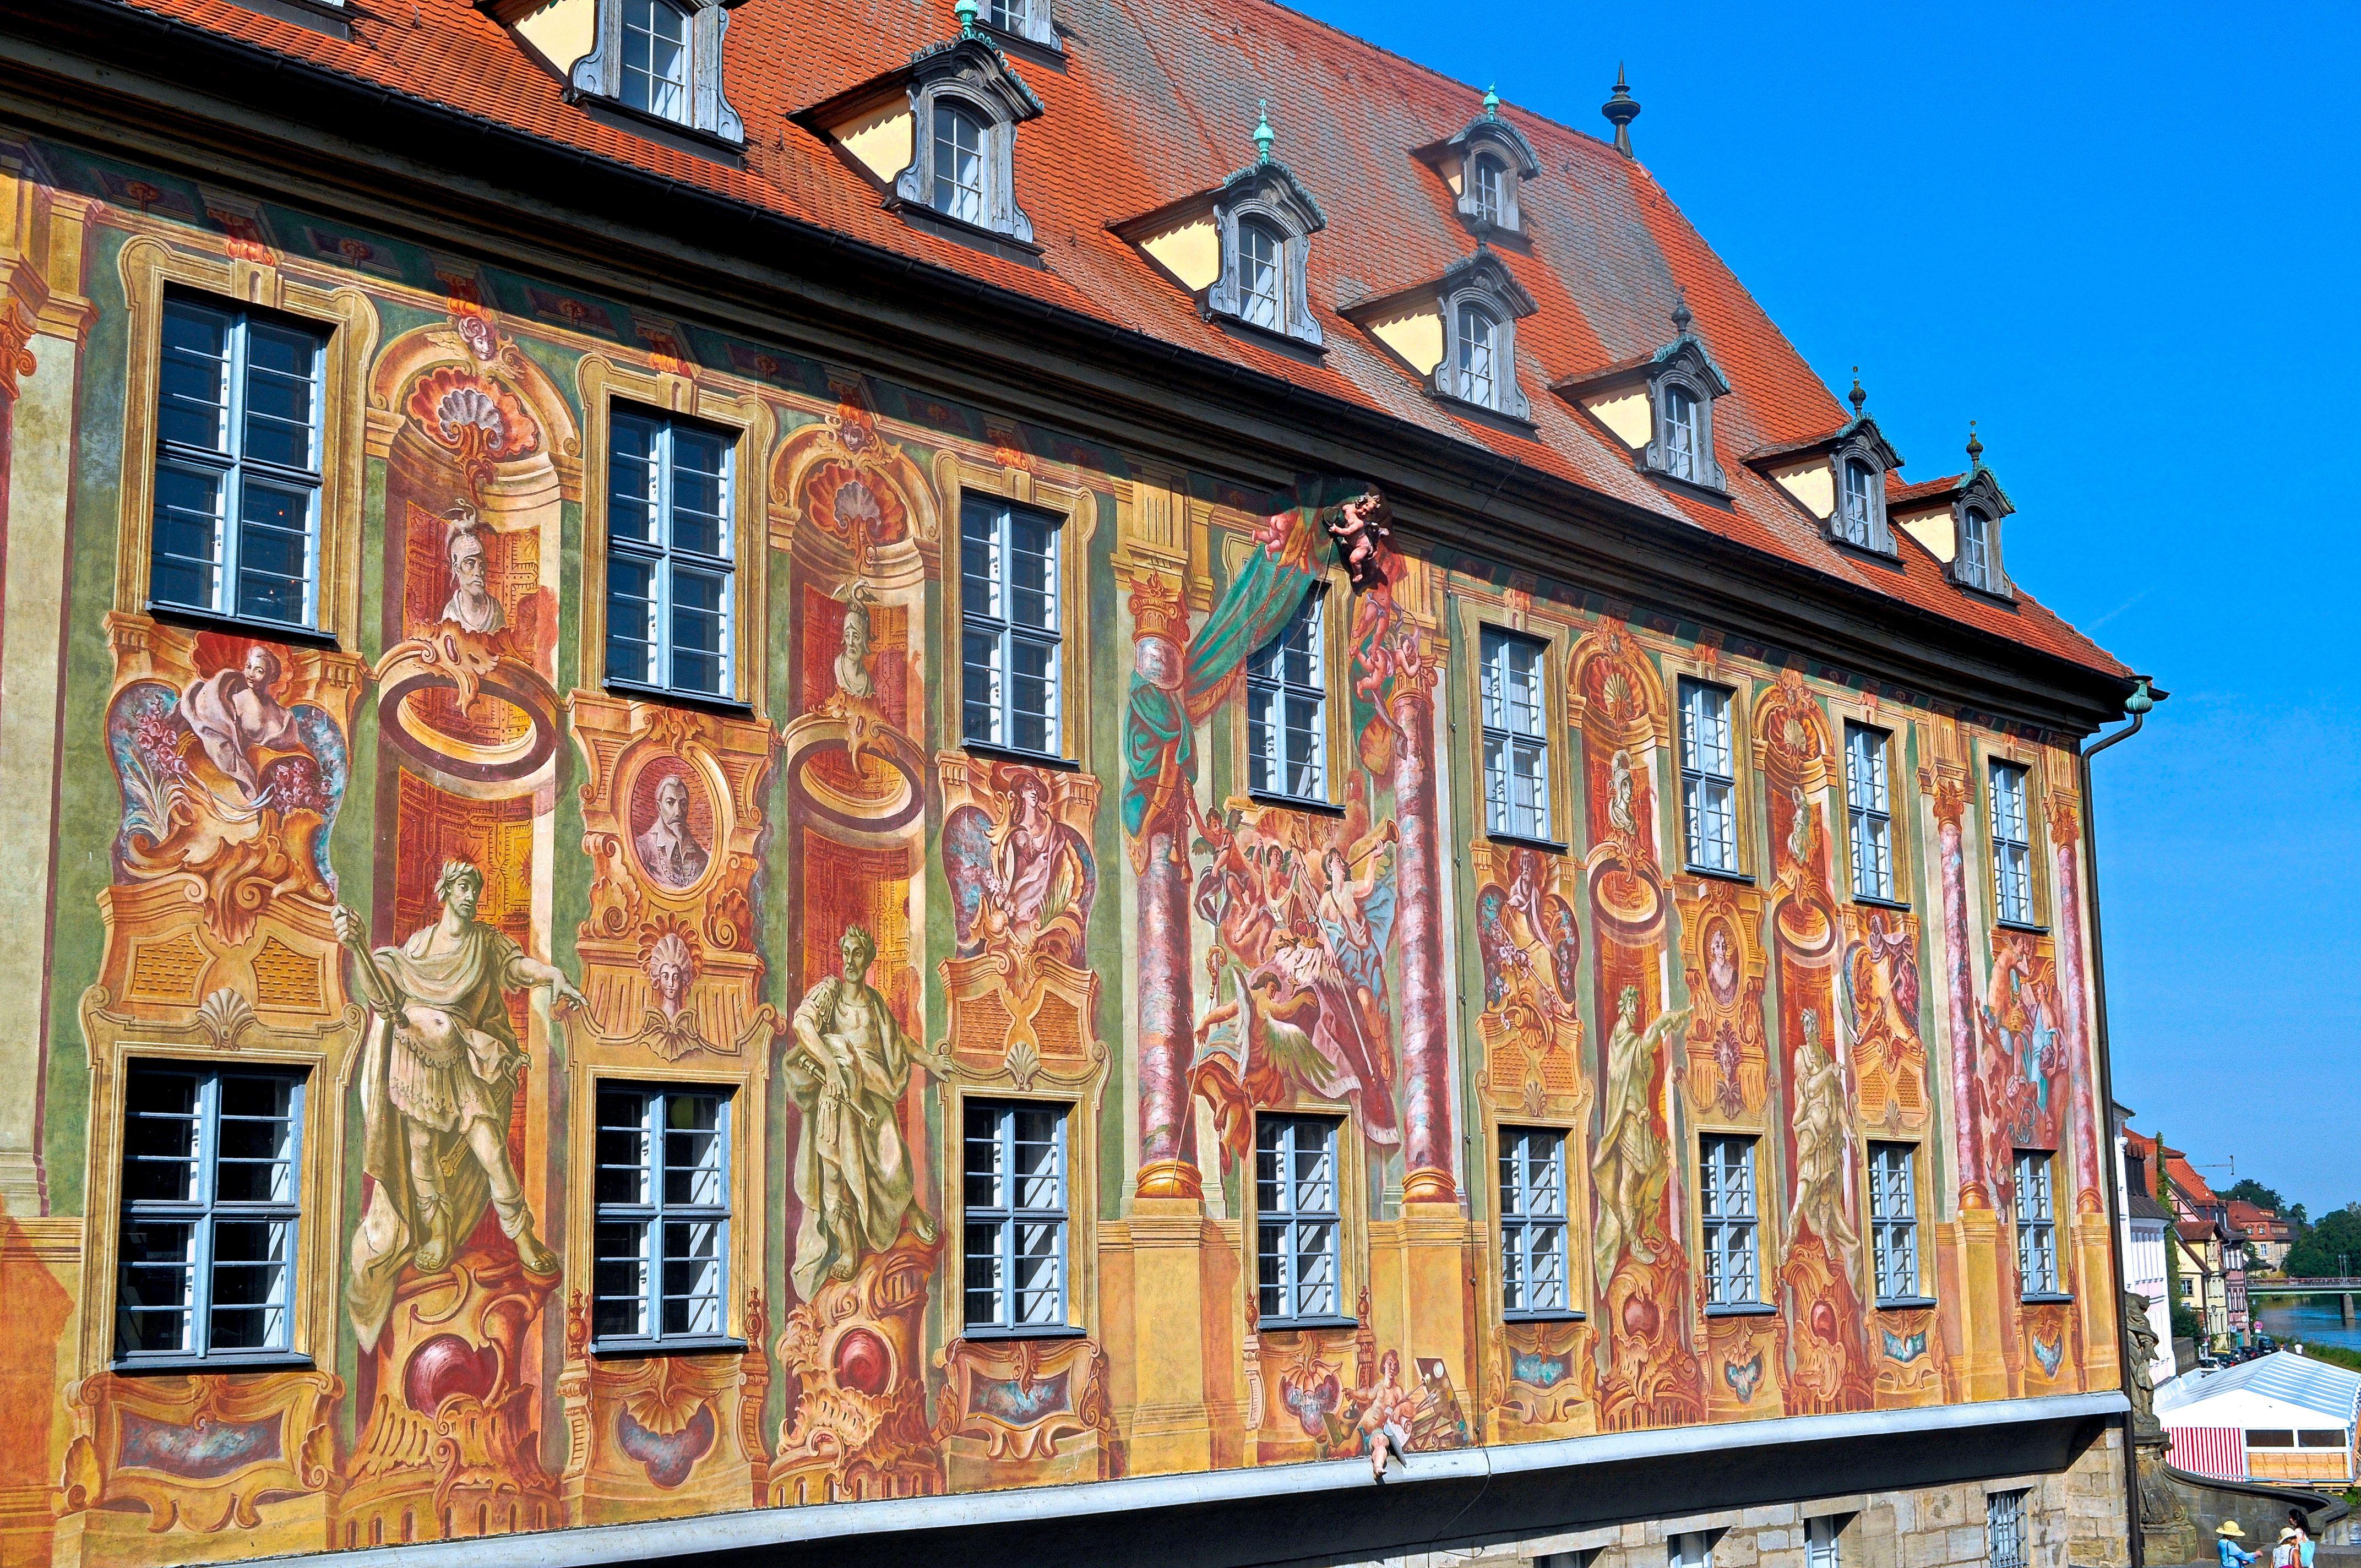 Bamberg Rathaus Fresco The Old Town Hall S Frescoes Never Fail